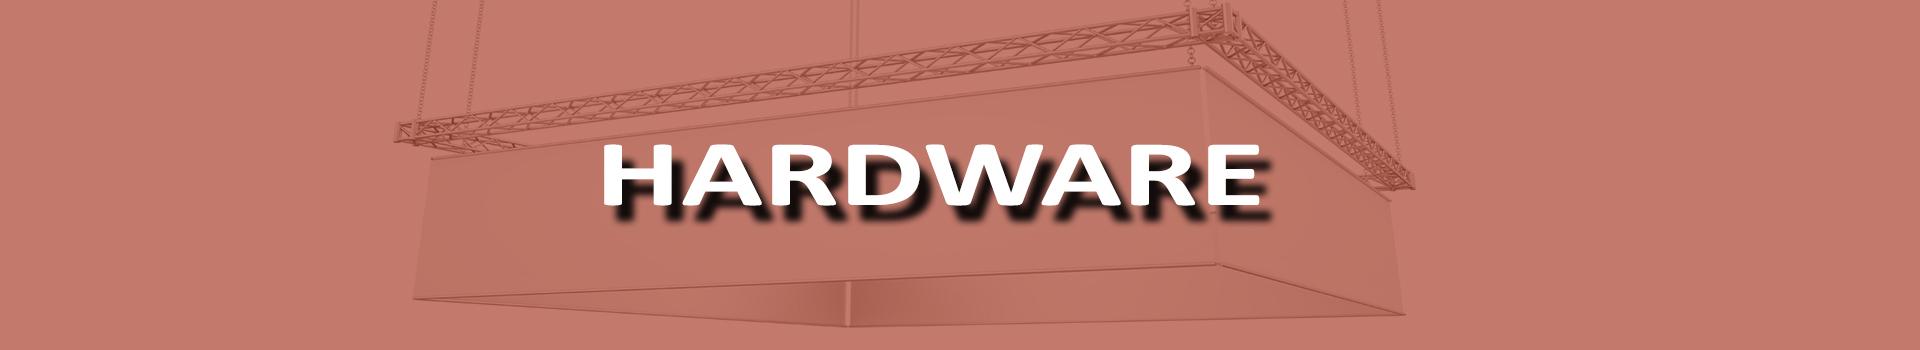 Hardware ll